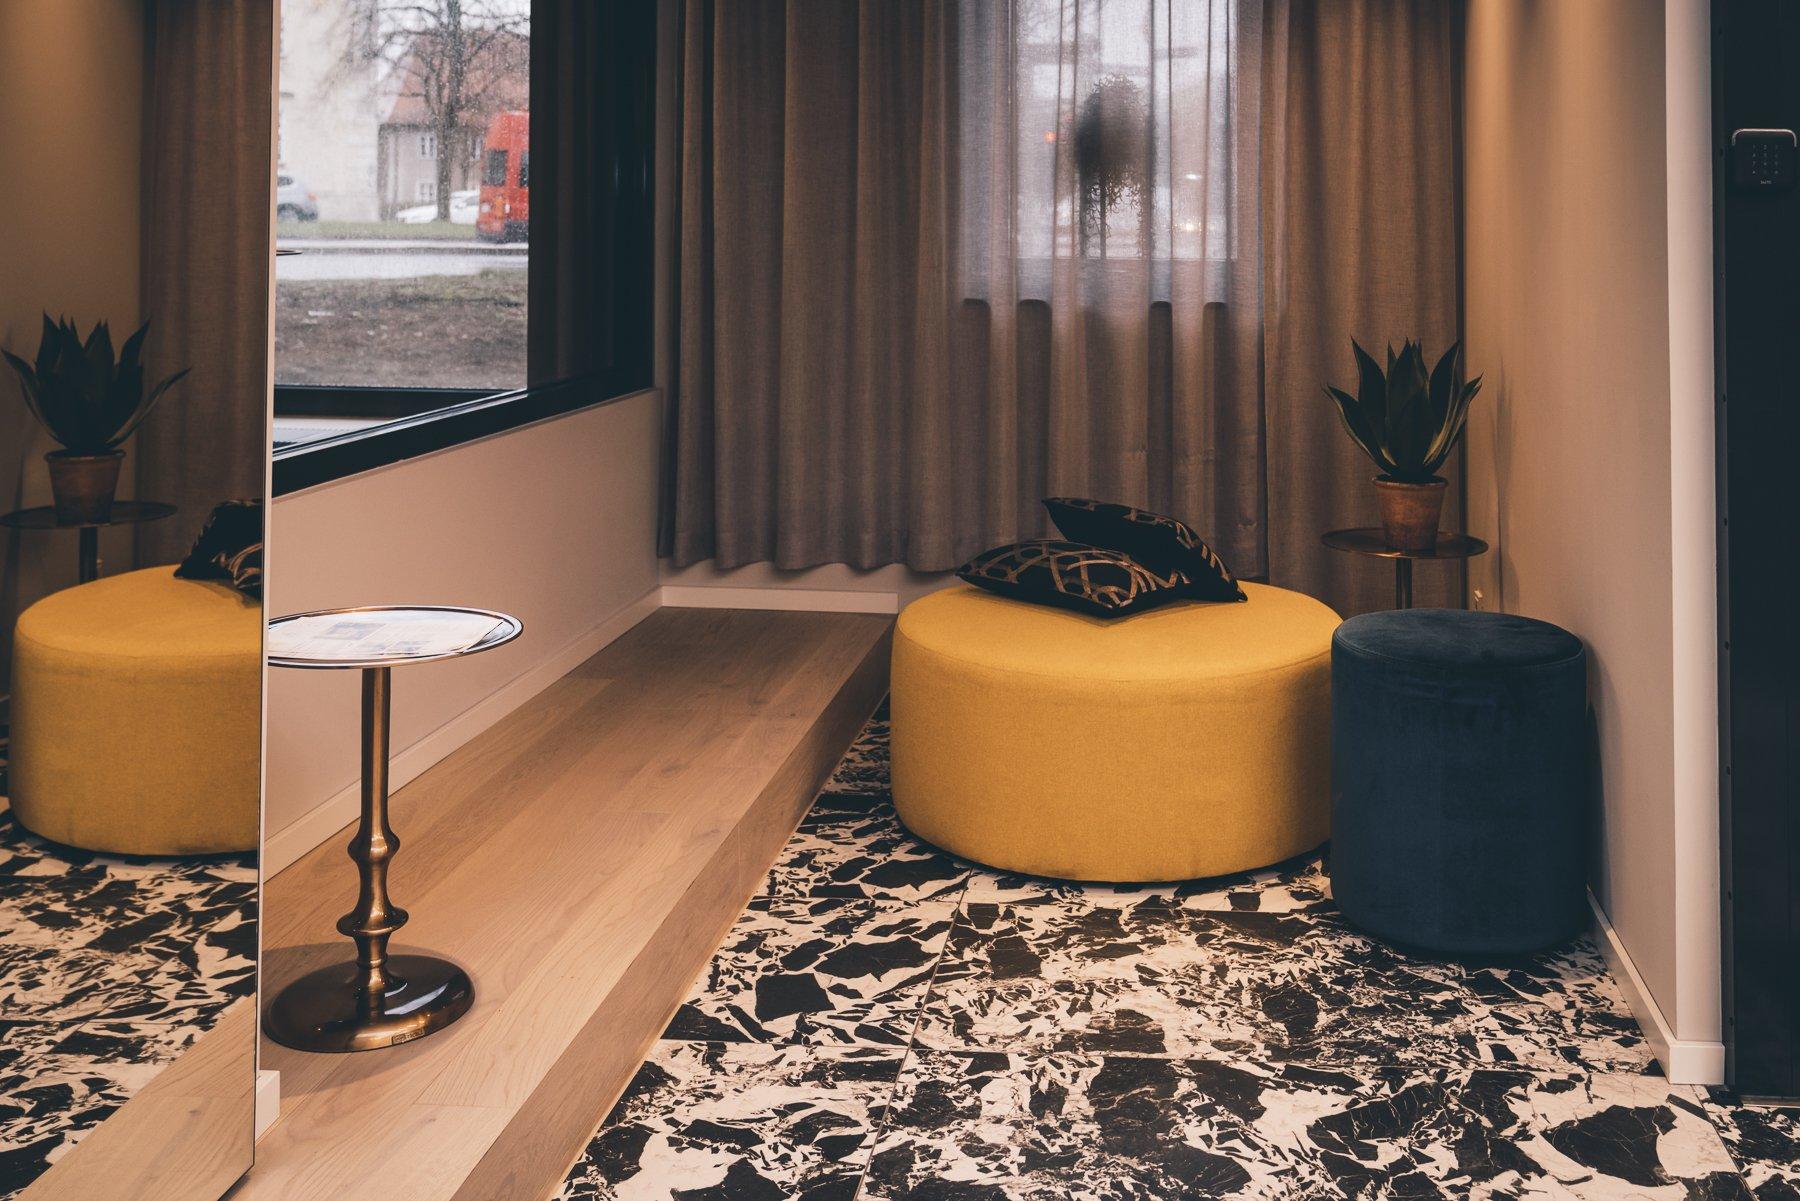 Geheimtipp Muenchen Hotel Joyn Apartments12 – ©wunderland media GmbH